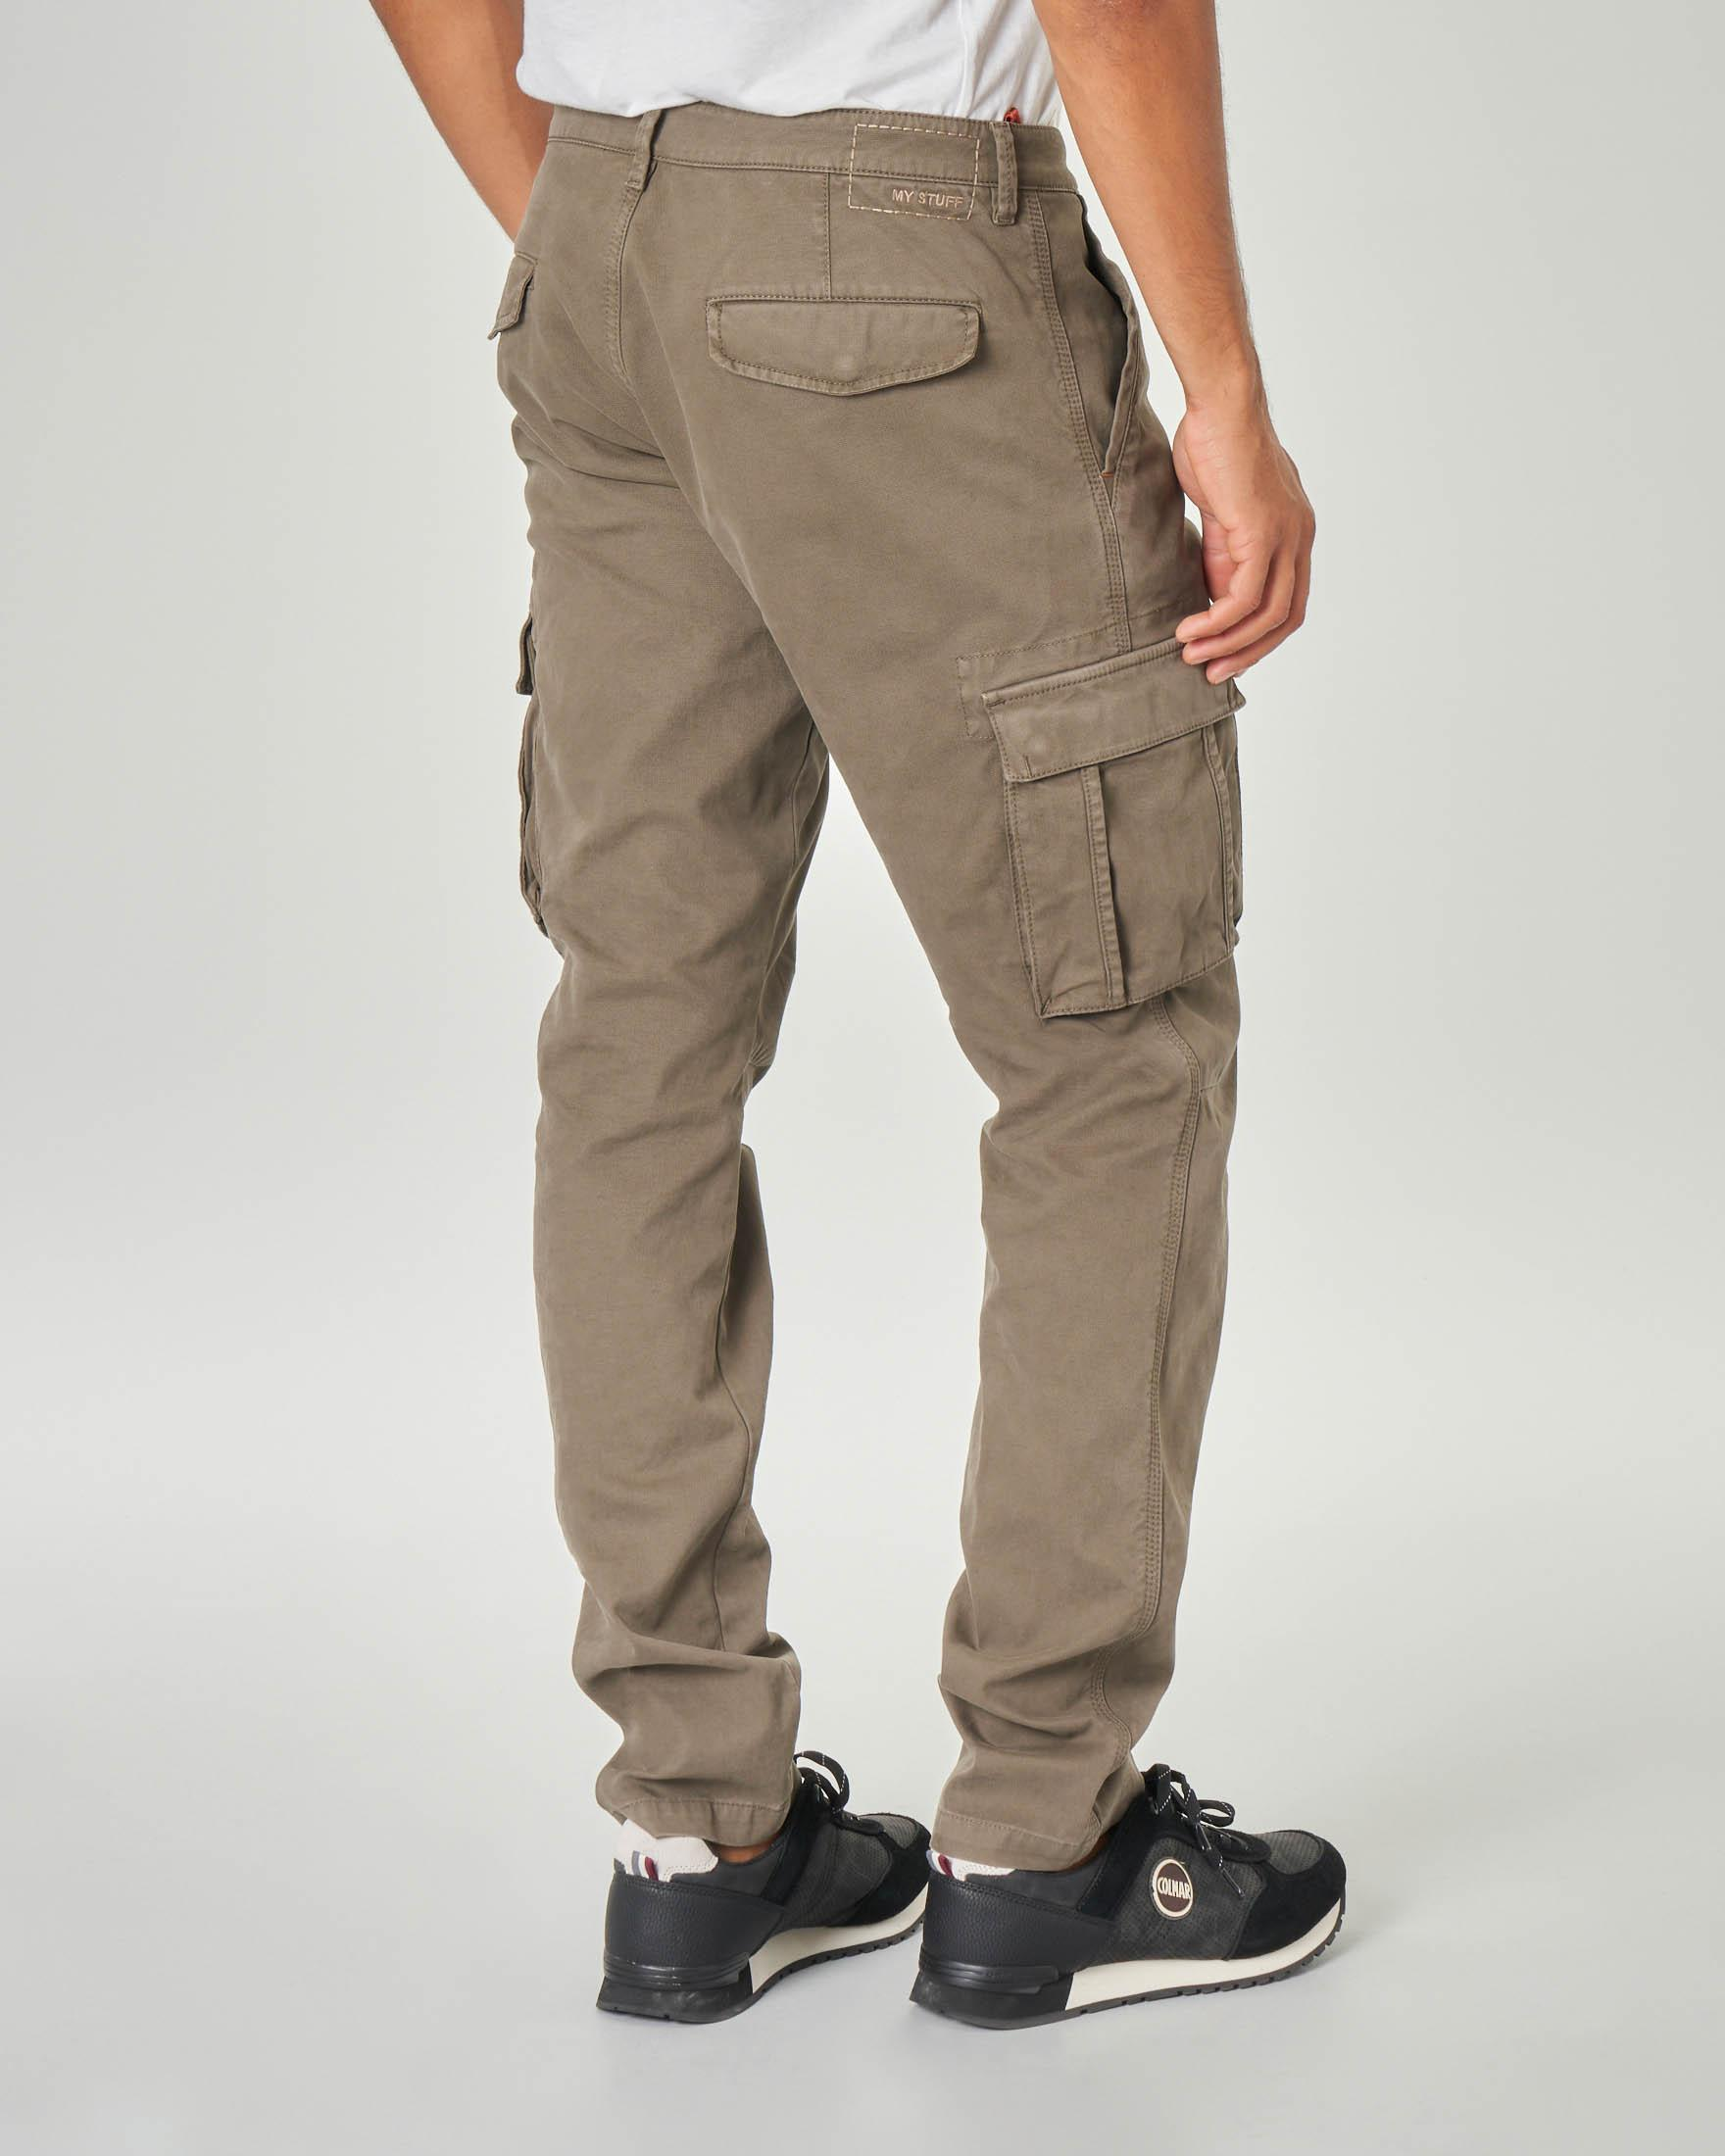 Pantalone tasconato color tortora